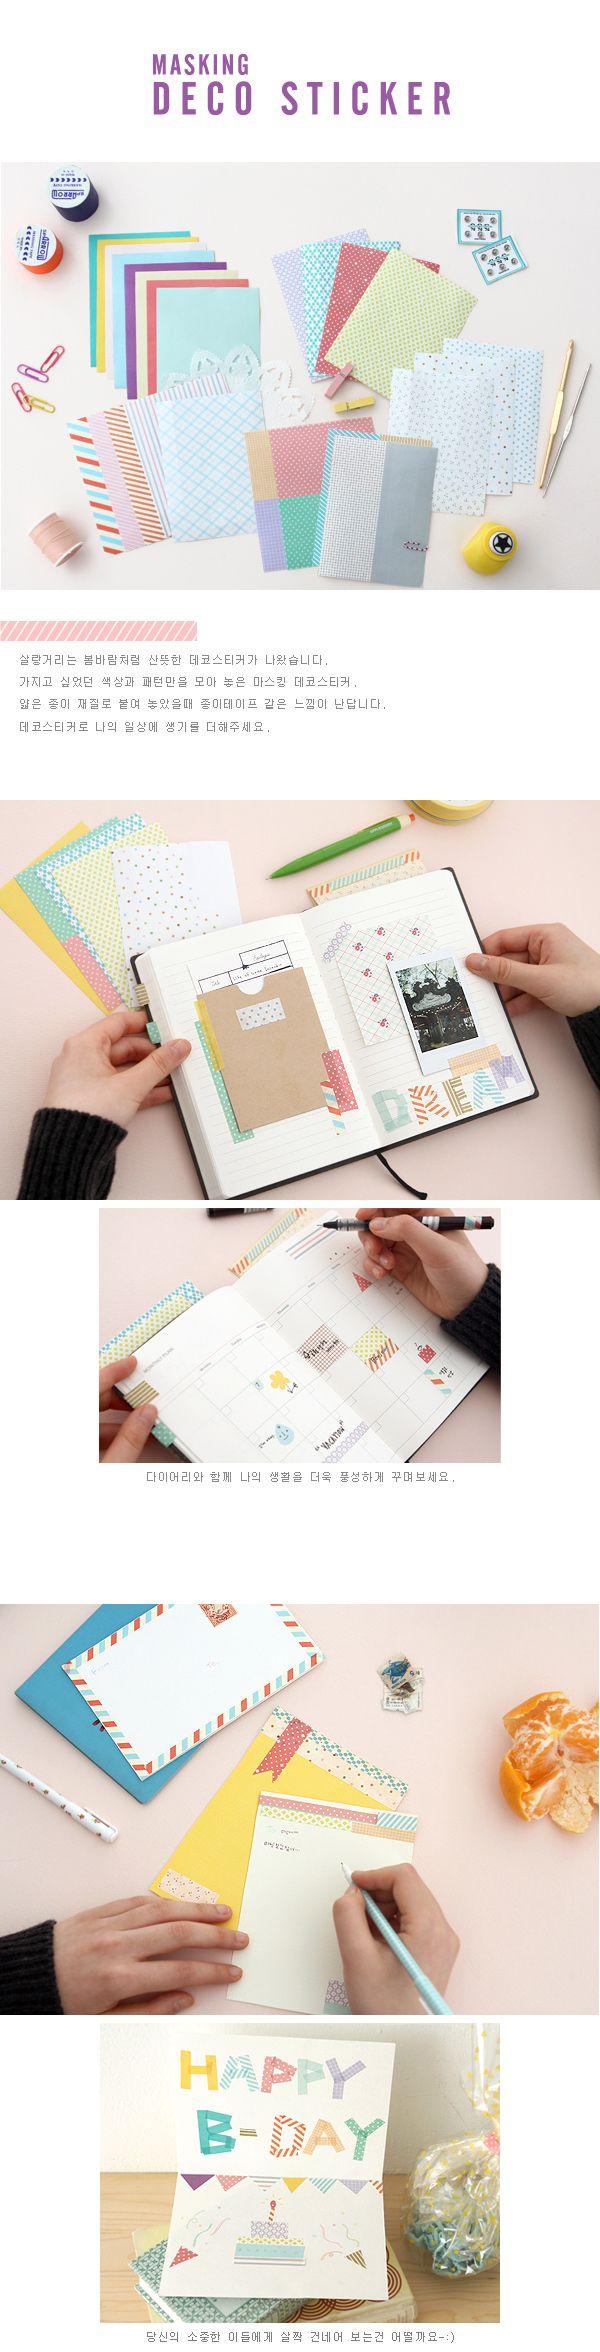 Masking Deco Sticker Diary Scrapbook Pastel Color Point Pattern Dot Label Decor. http://www.ebay.es/